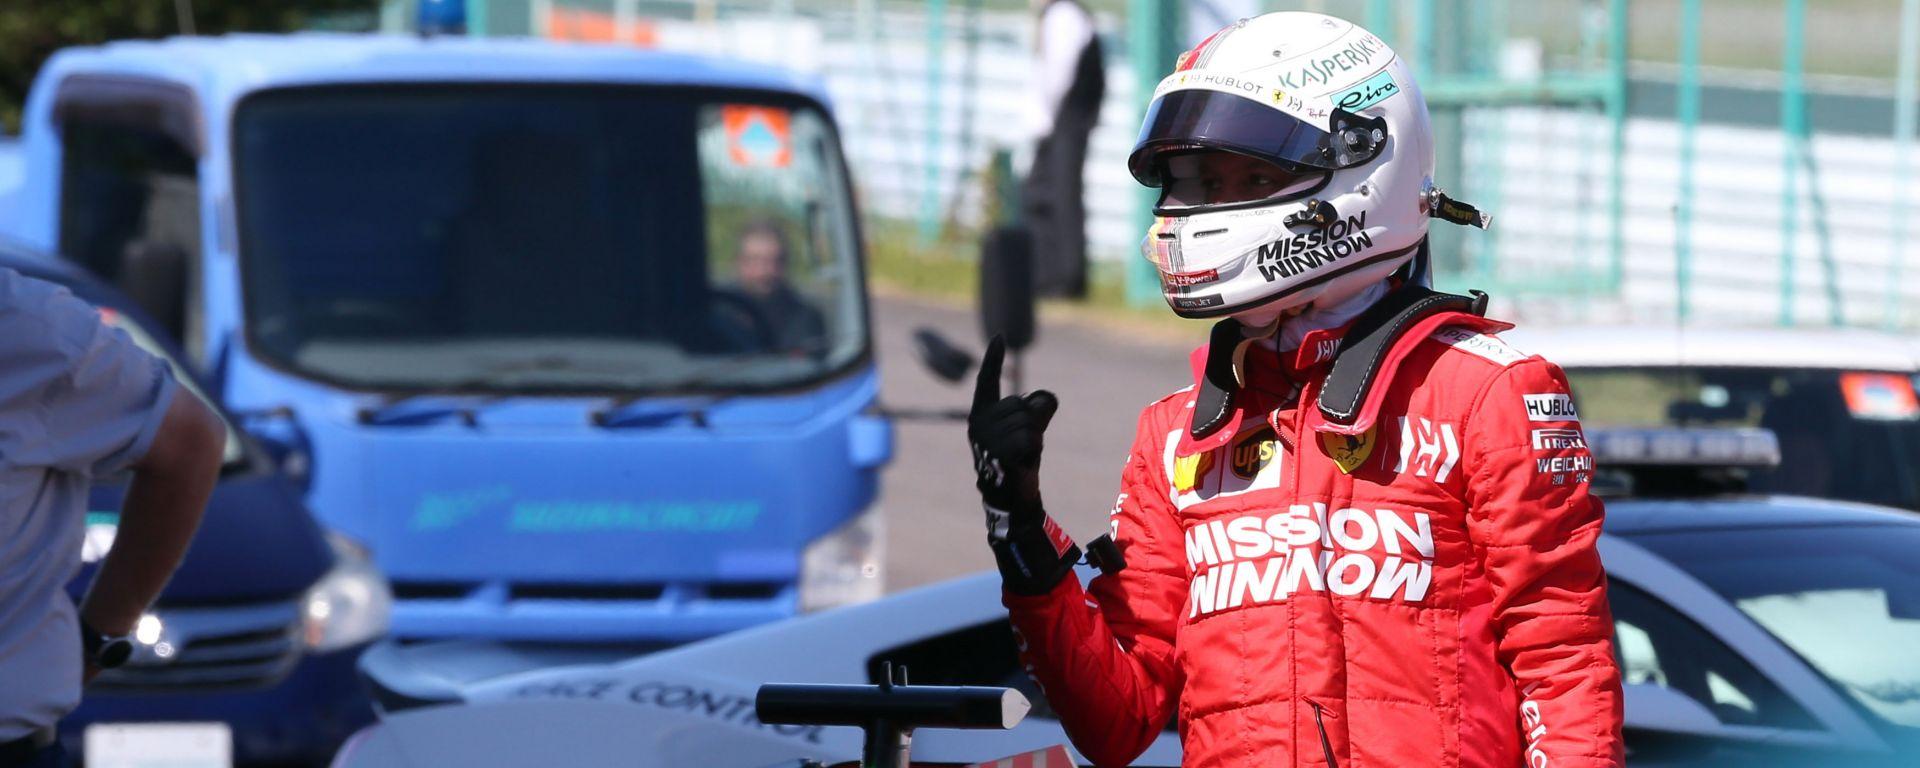 F1 GP Giappone 2019, Suzuka: Sebastian Vettel (Ferrari) è il poleman